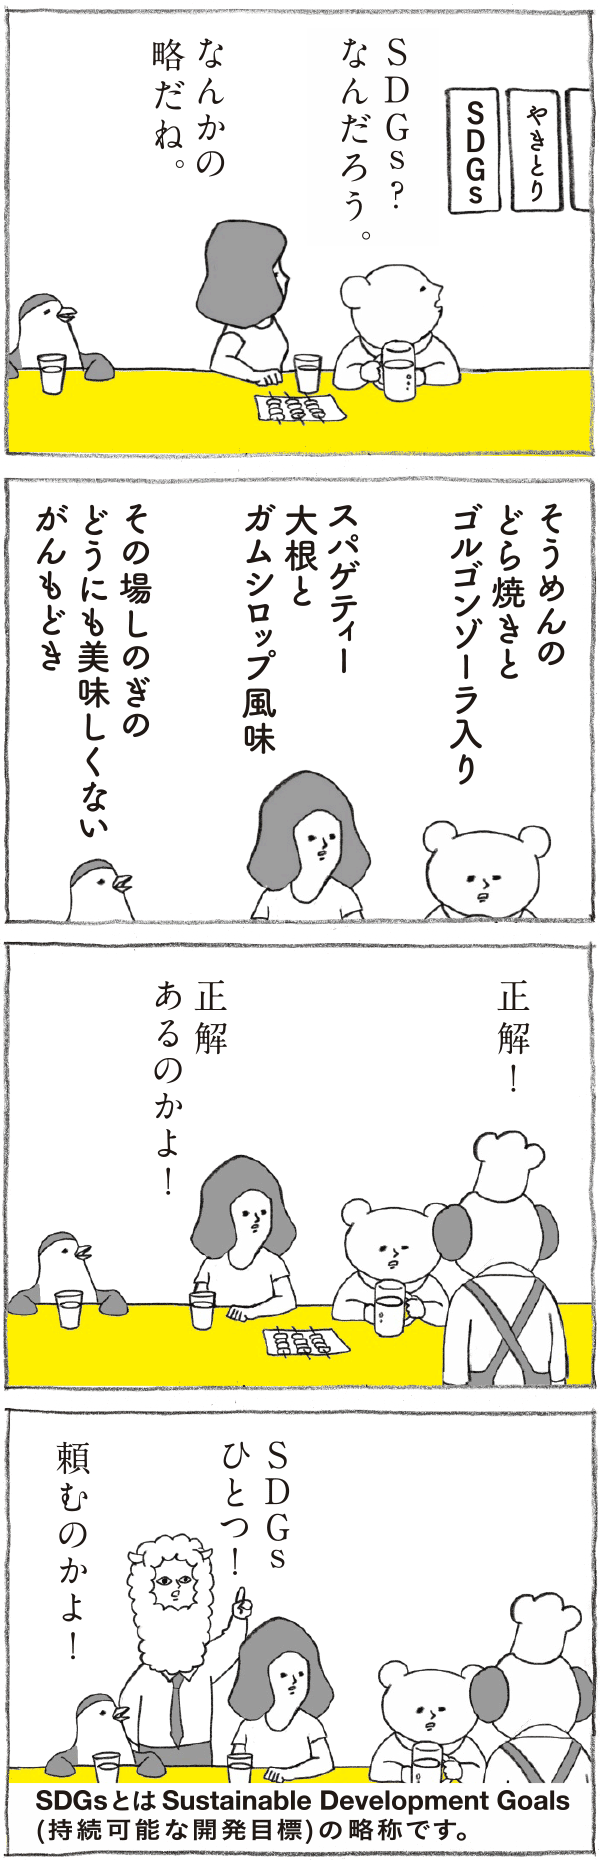 Hanako 1189号:おかわり自由